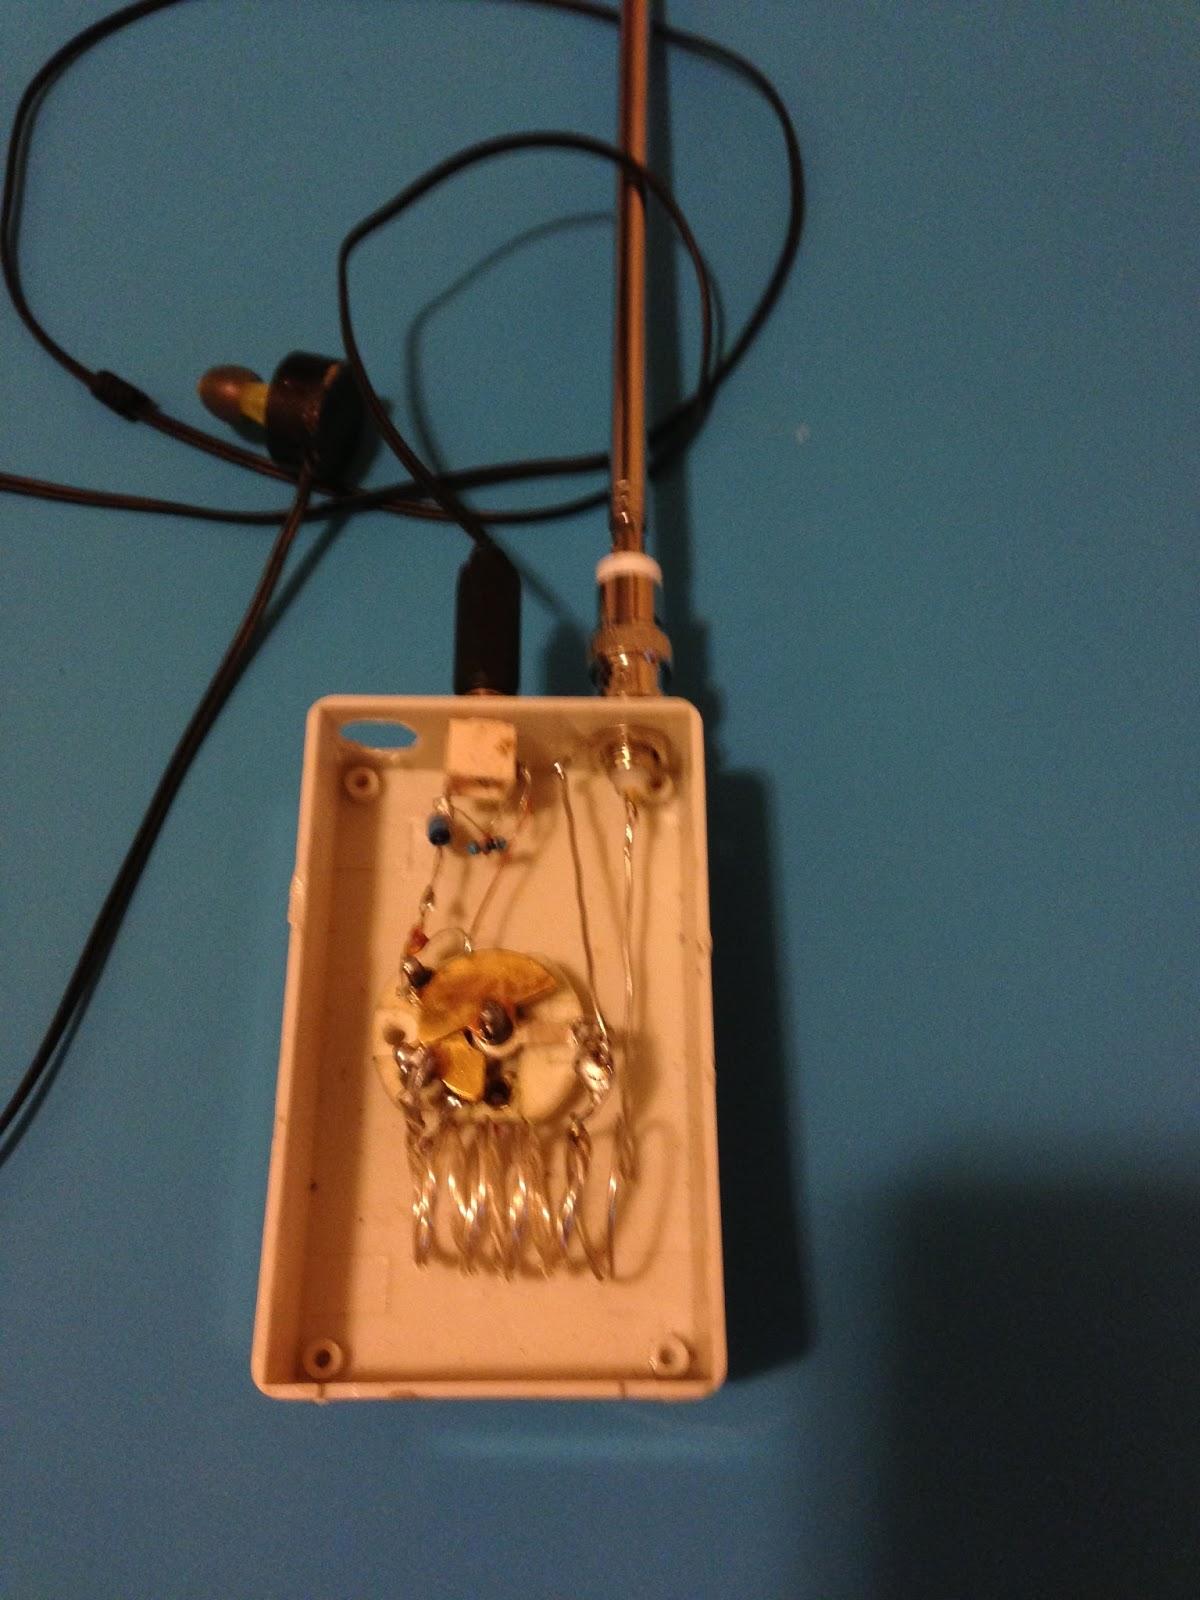 Fm Crystal Radio Schematic Trusted Wiring Diagram Simple Shortwave Transmitter Eeweb Community Billys Diy Dream Shop Pirate